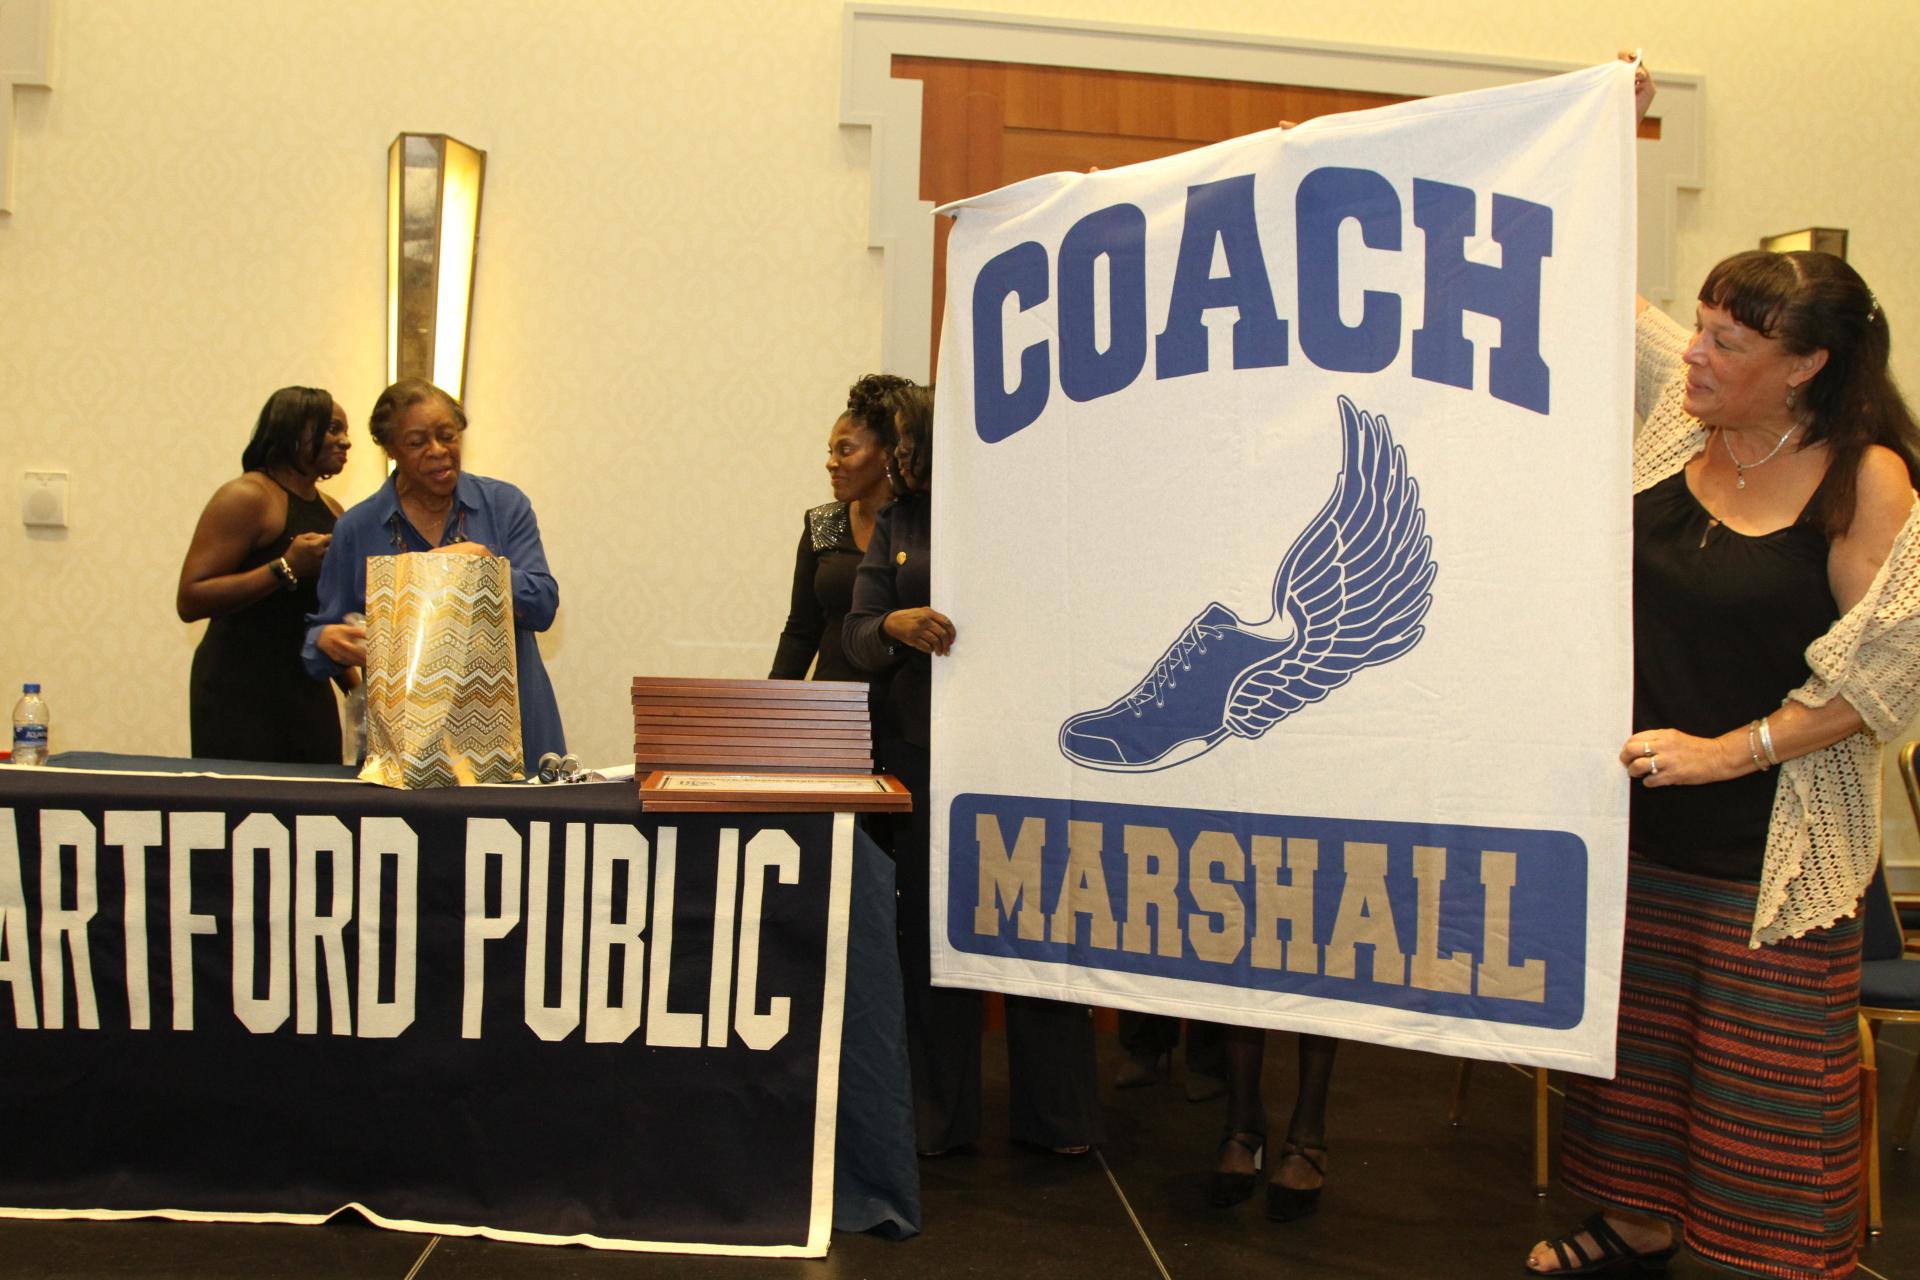 Coach Marshall